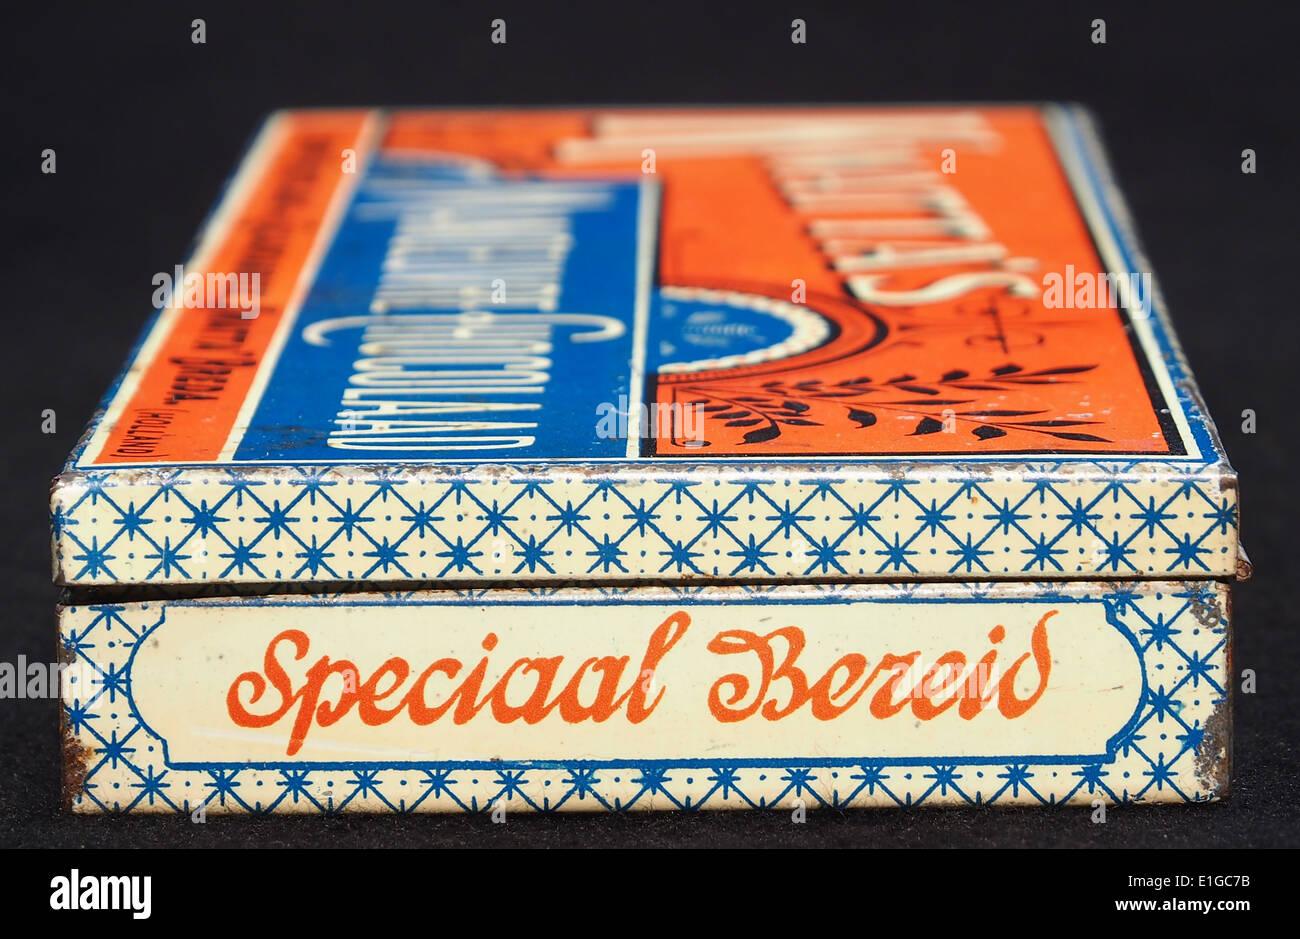 Kwattas Manoeuvre Chocolaad blik, foto3 - Stock Image